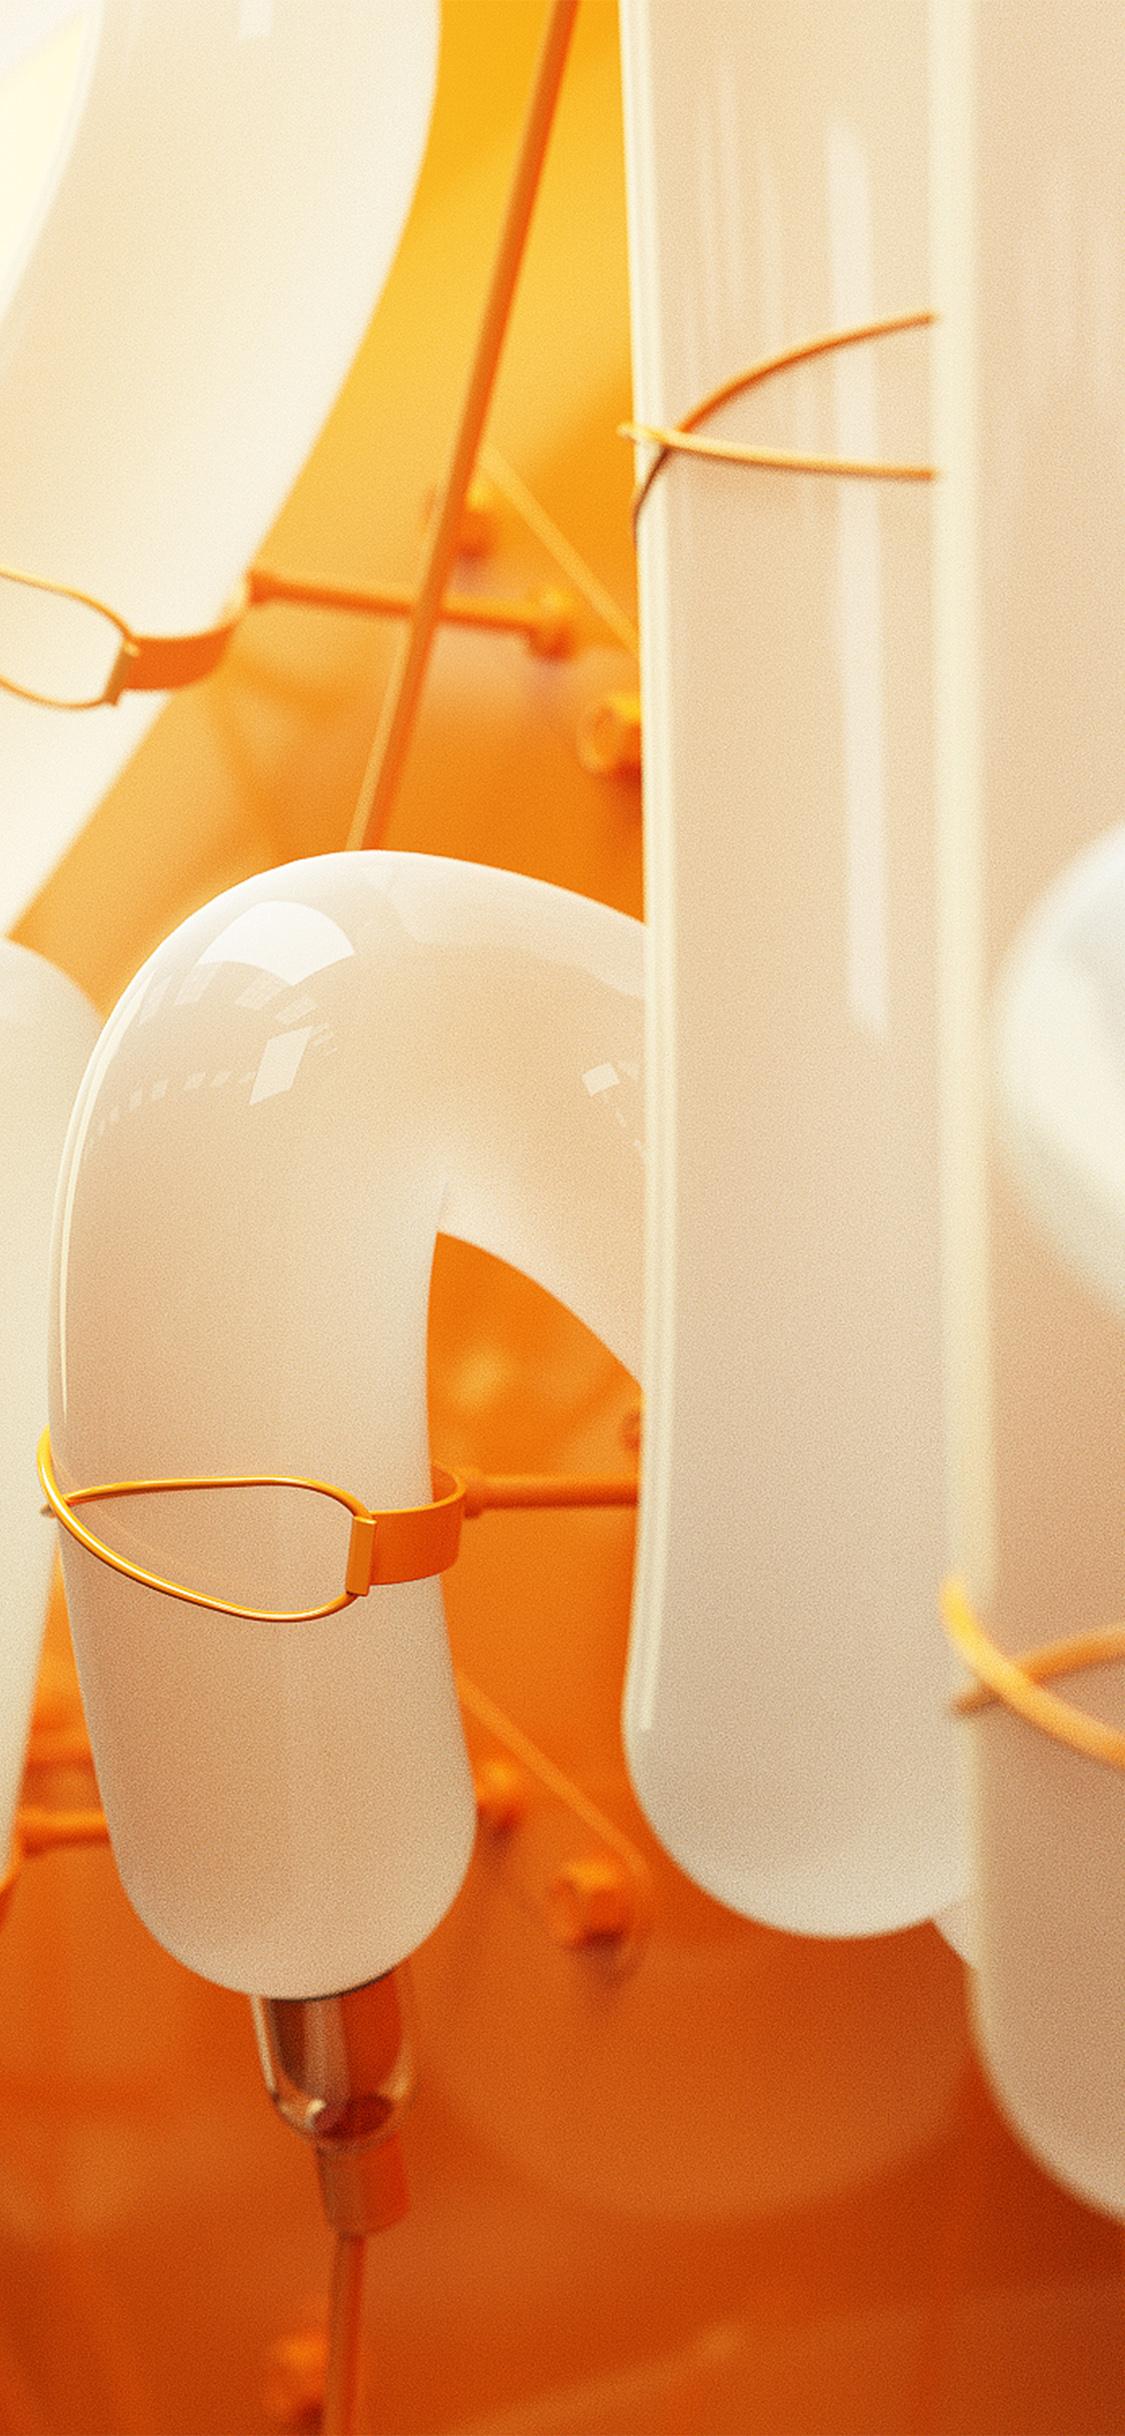 iPhoneXpapers.com-Apple-iPhone-wallpaper-vw93-pump-tube-orange-pattern-background